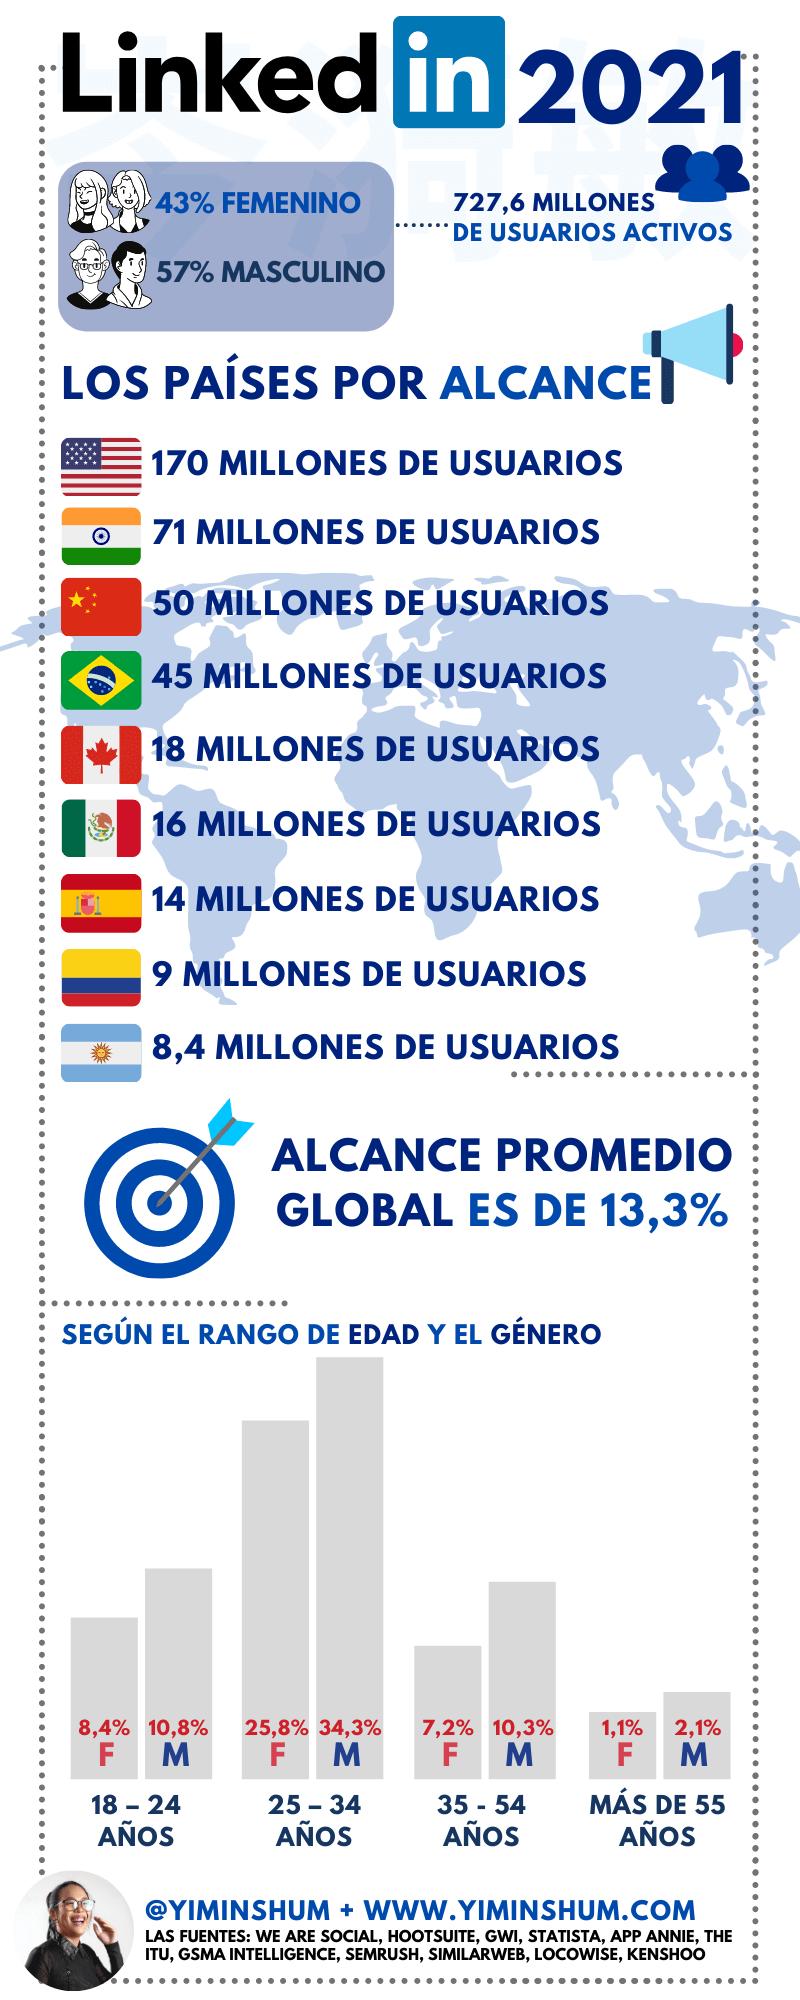 Los datos de LinkedIn en 2021 #infografia #infographic #socialmedia